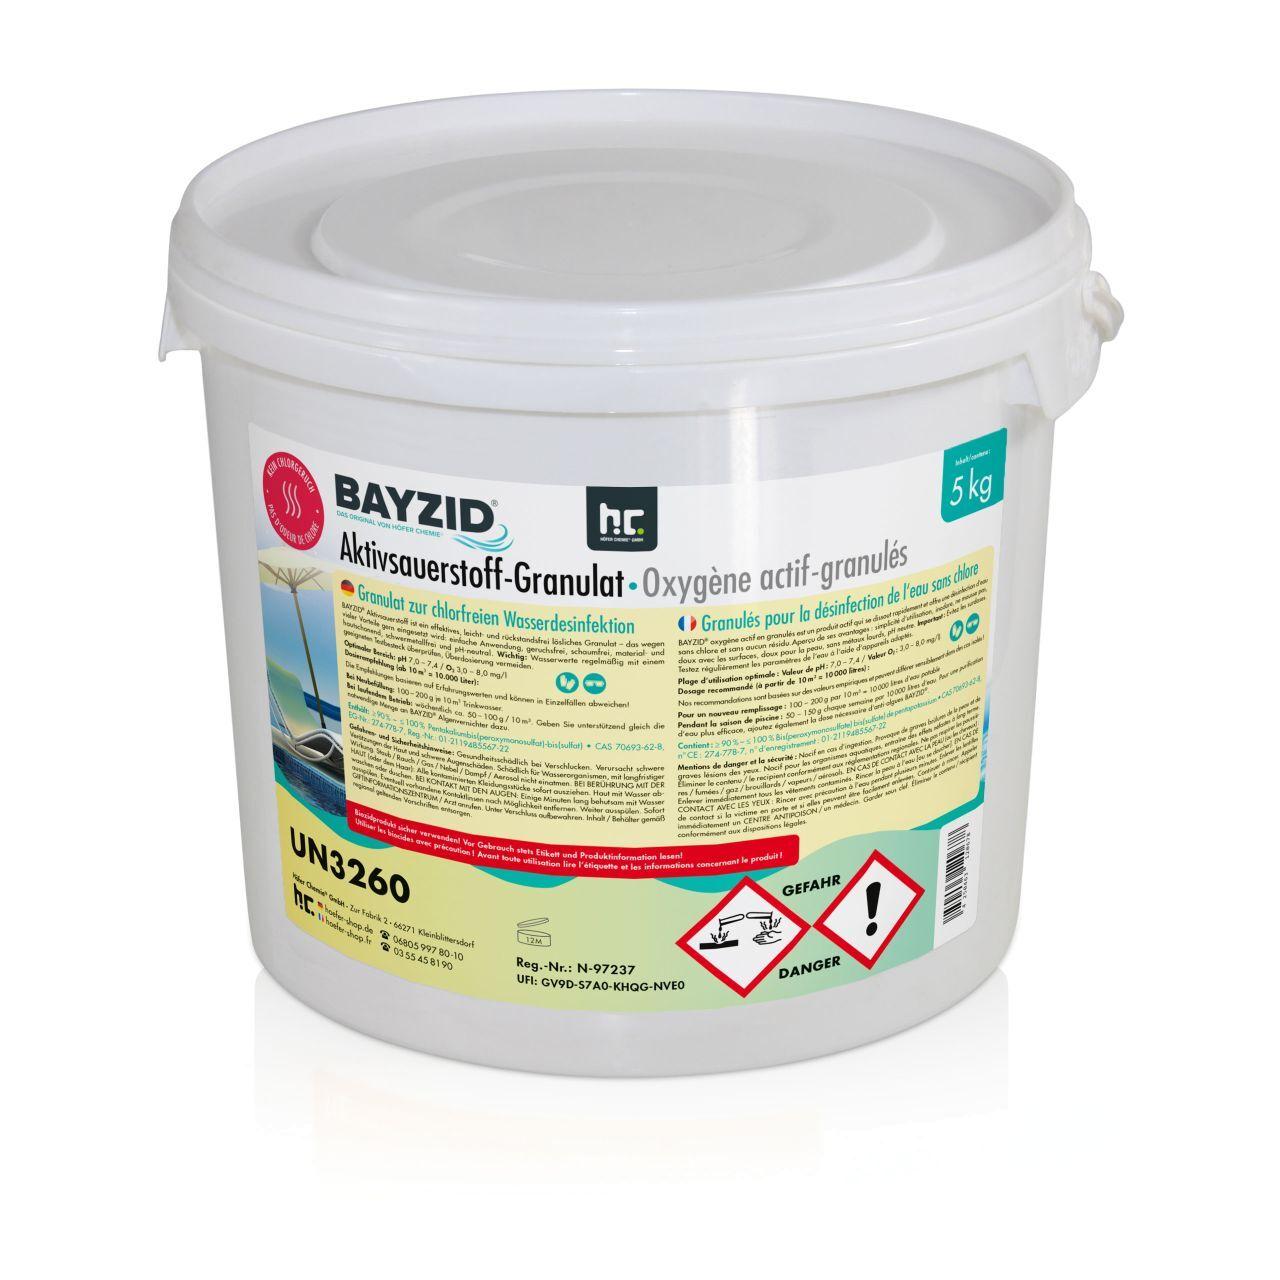 Höfer Chemie 10 kg BAYZID® Oxygène actif – granulés (2 x 5 kg)